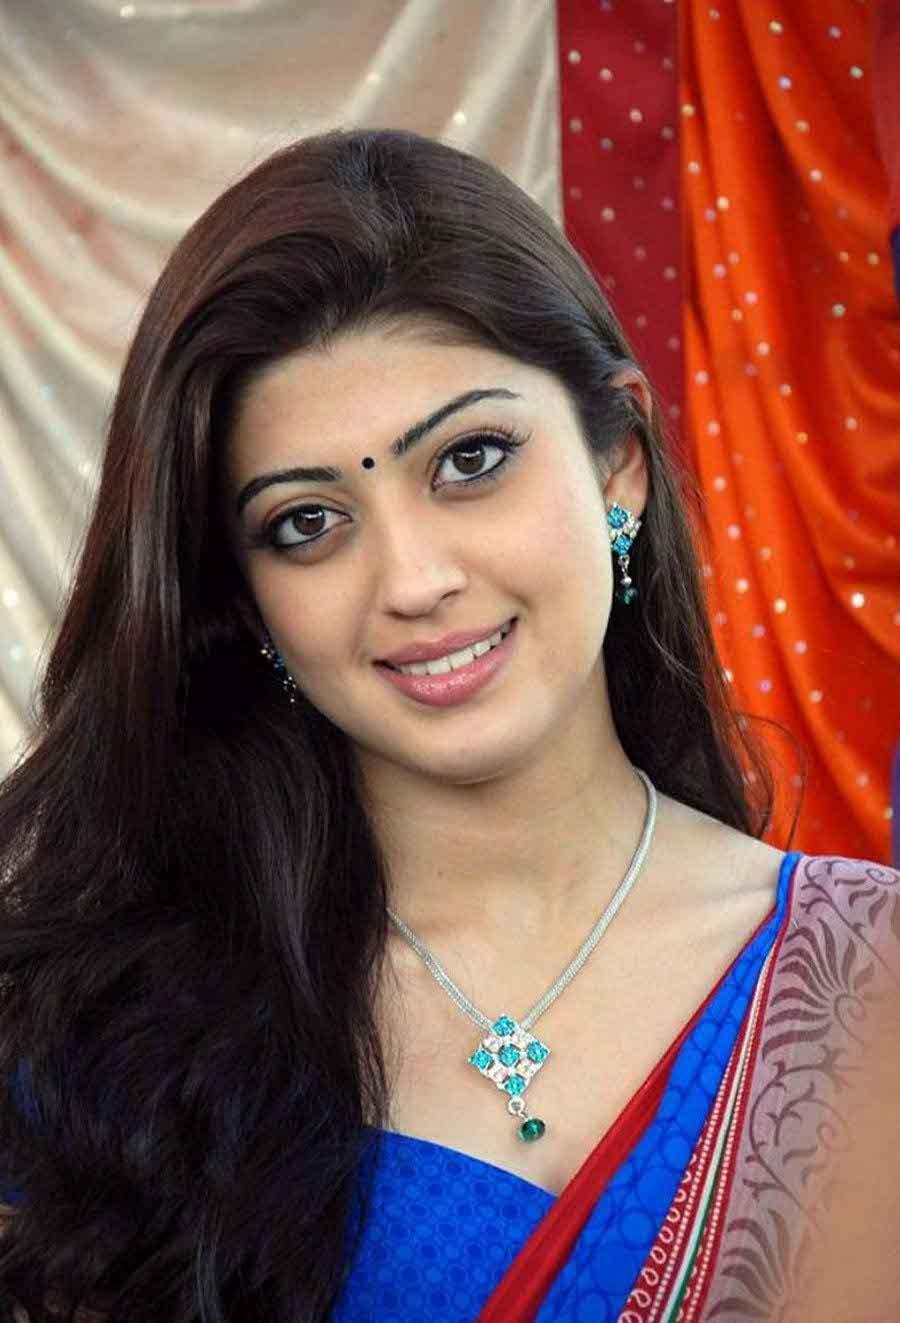 pranitha subash biography wiki age height family